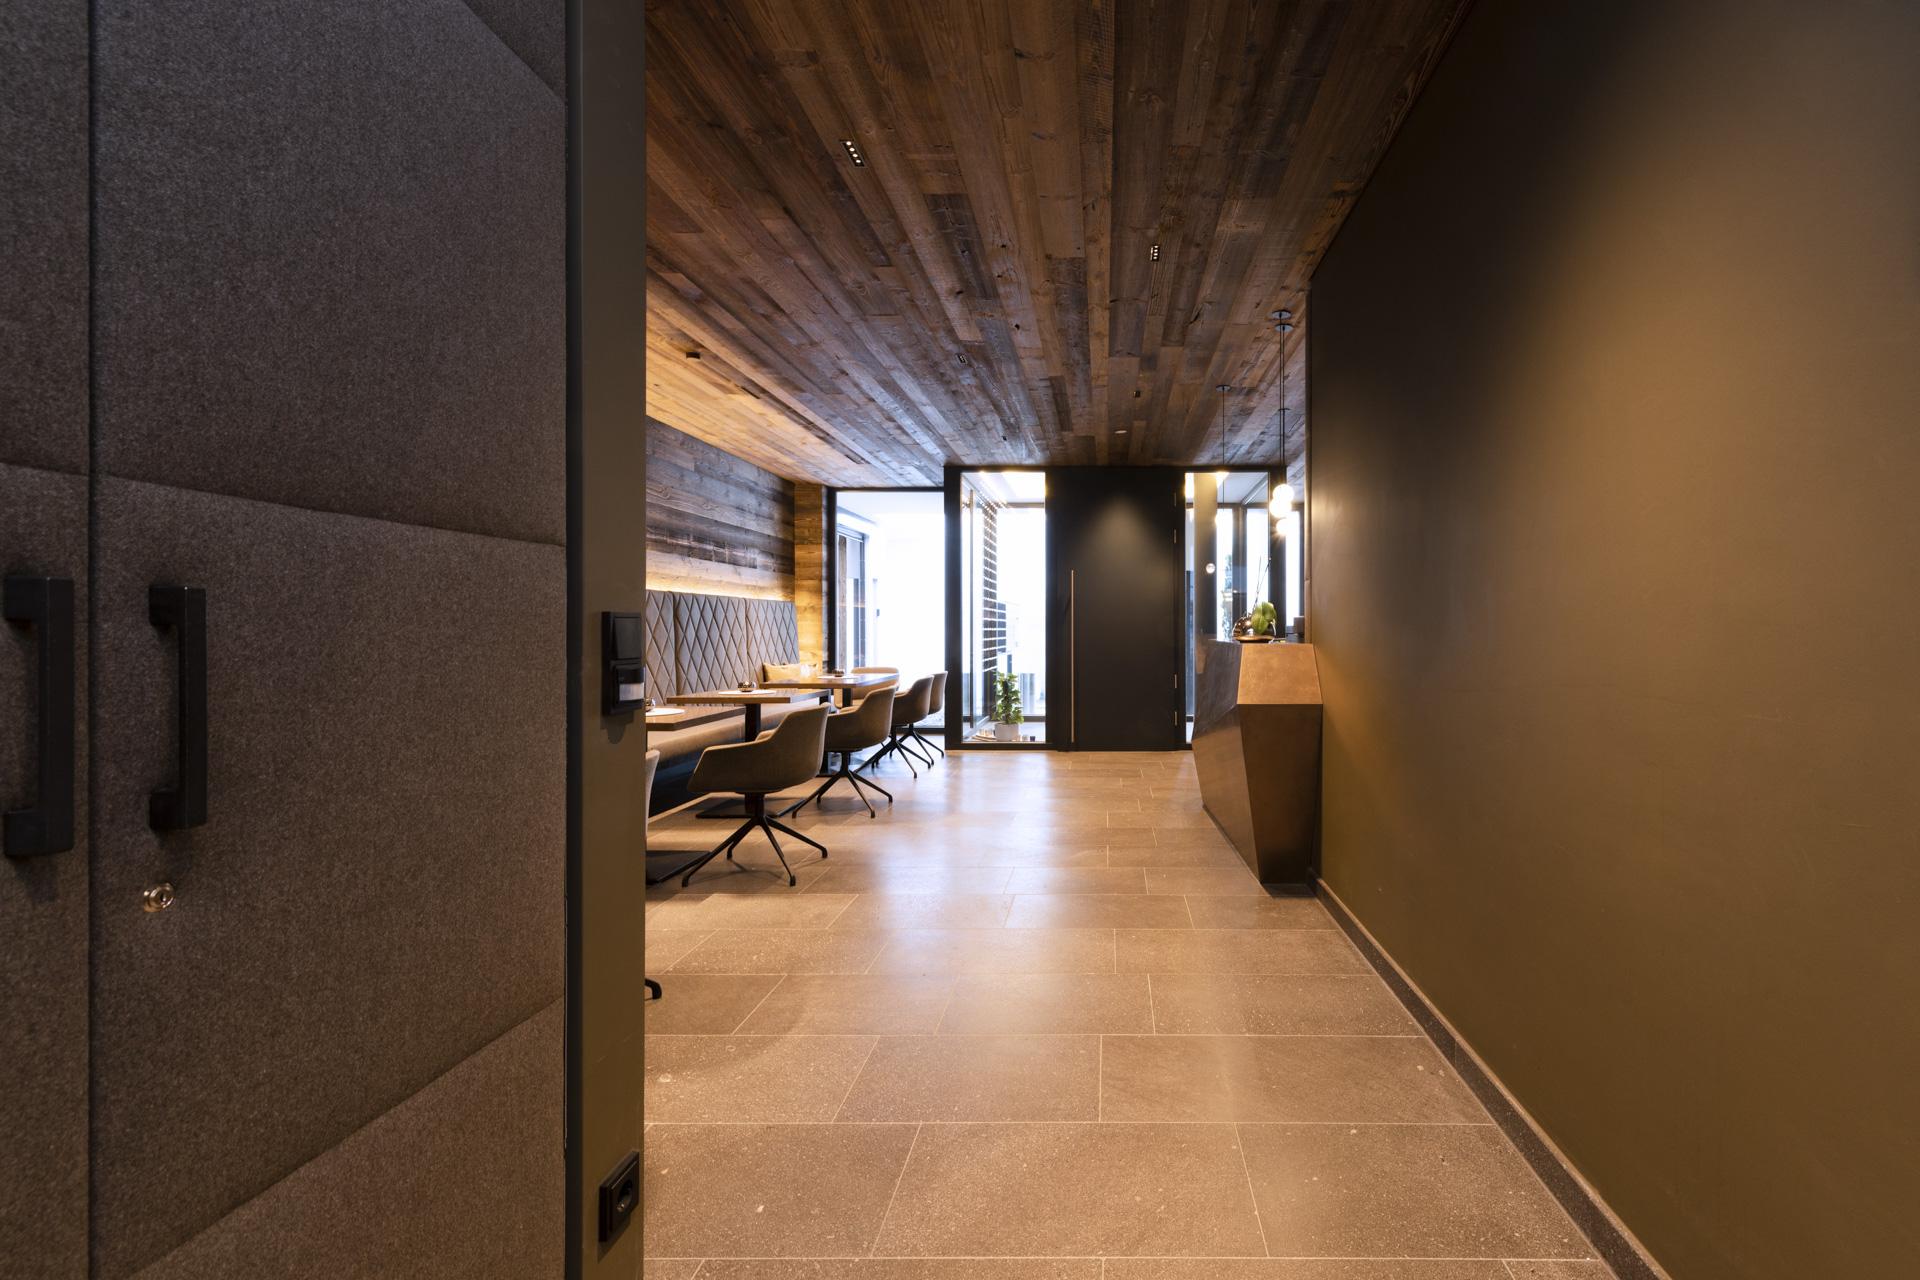 Tischlerei-Decker-Projekte-Mountain-Chalet-Kirchberg-Blick-zur-Lounge